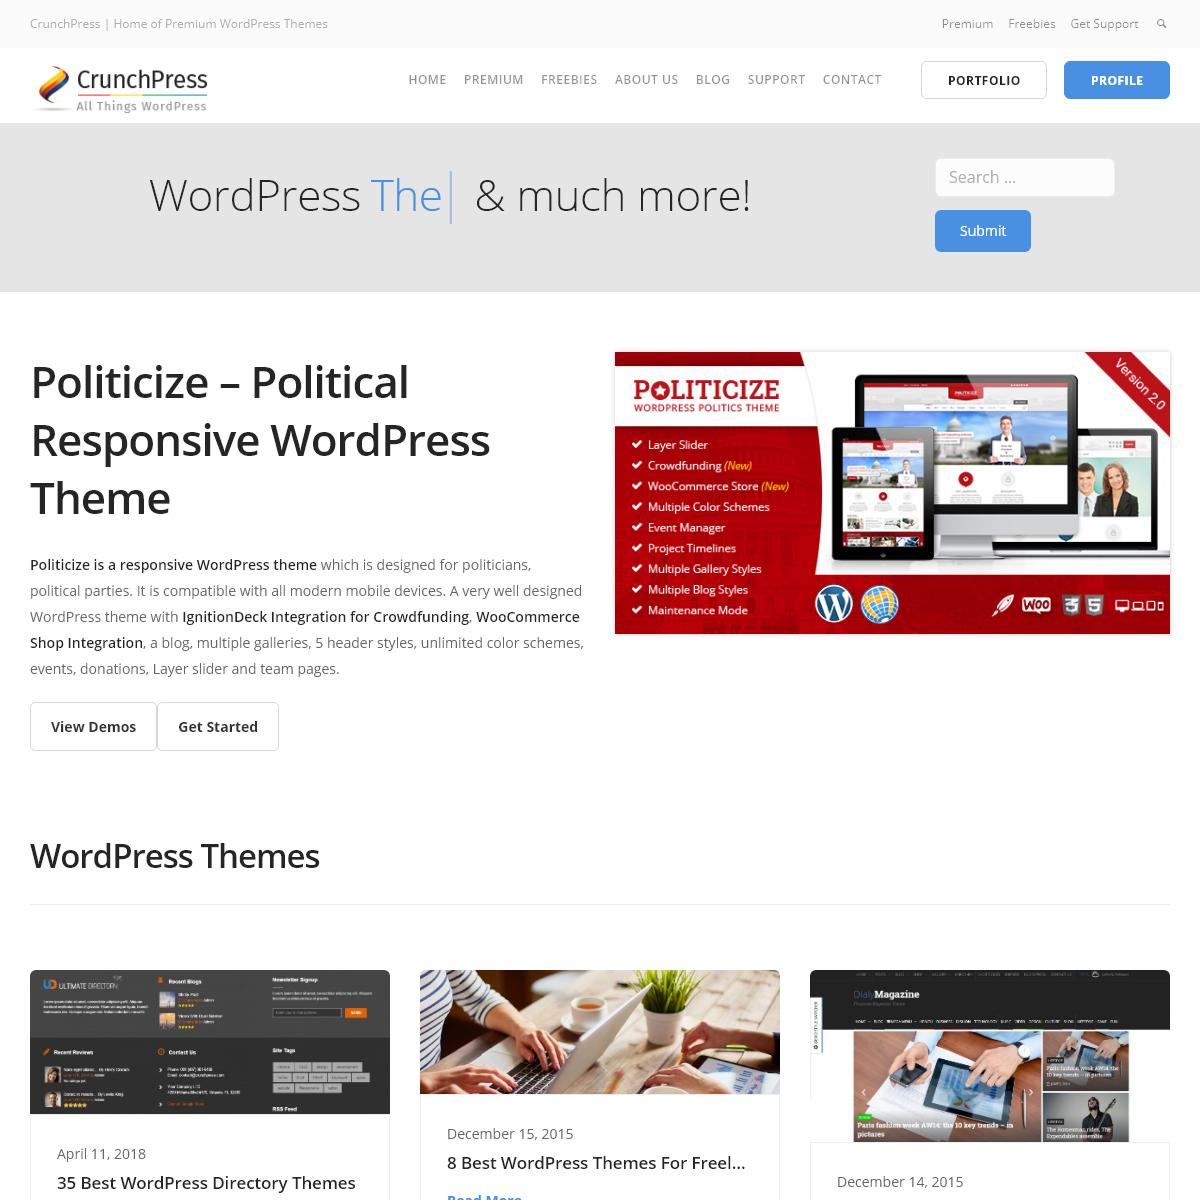 Best WordPress Themes - CrunchPress